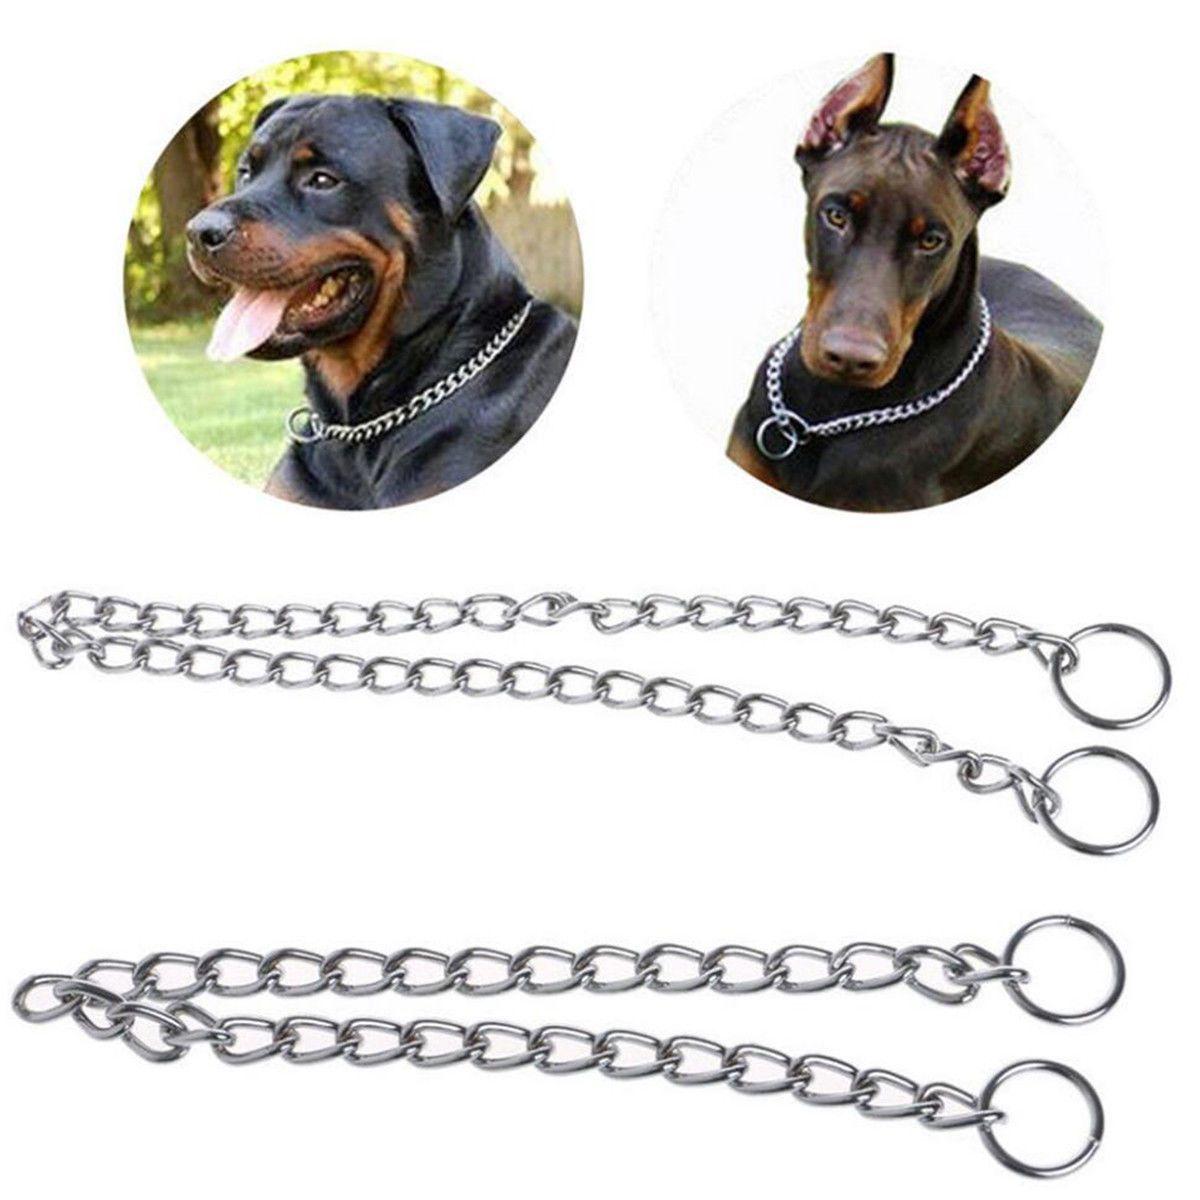 152 aud pet dog puppy choke chain choker collar strong